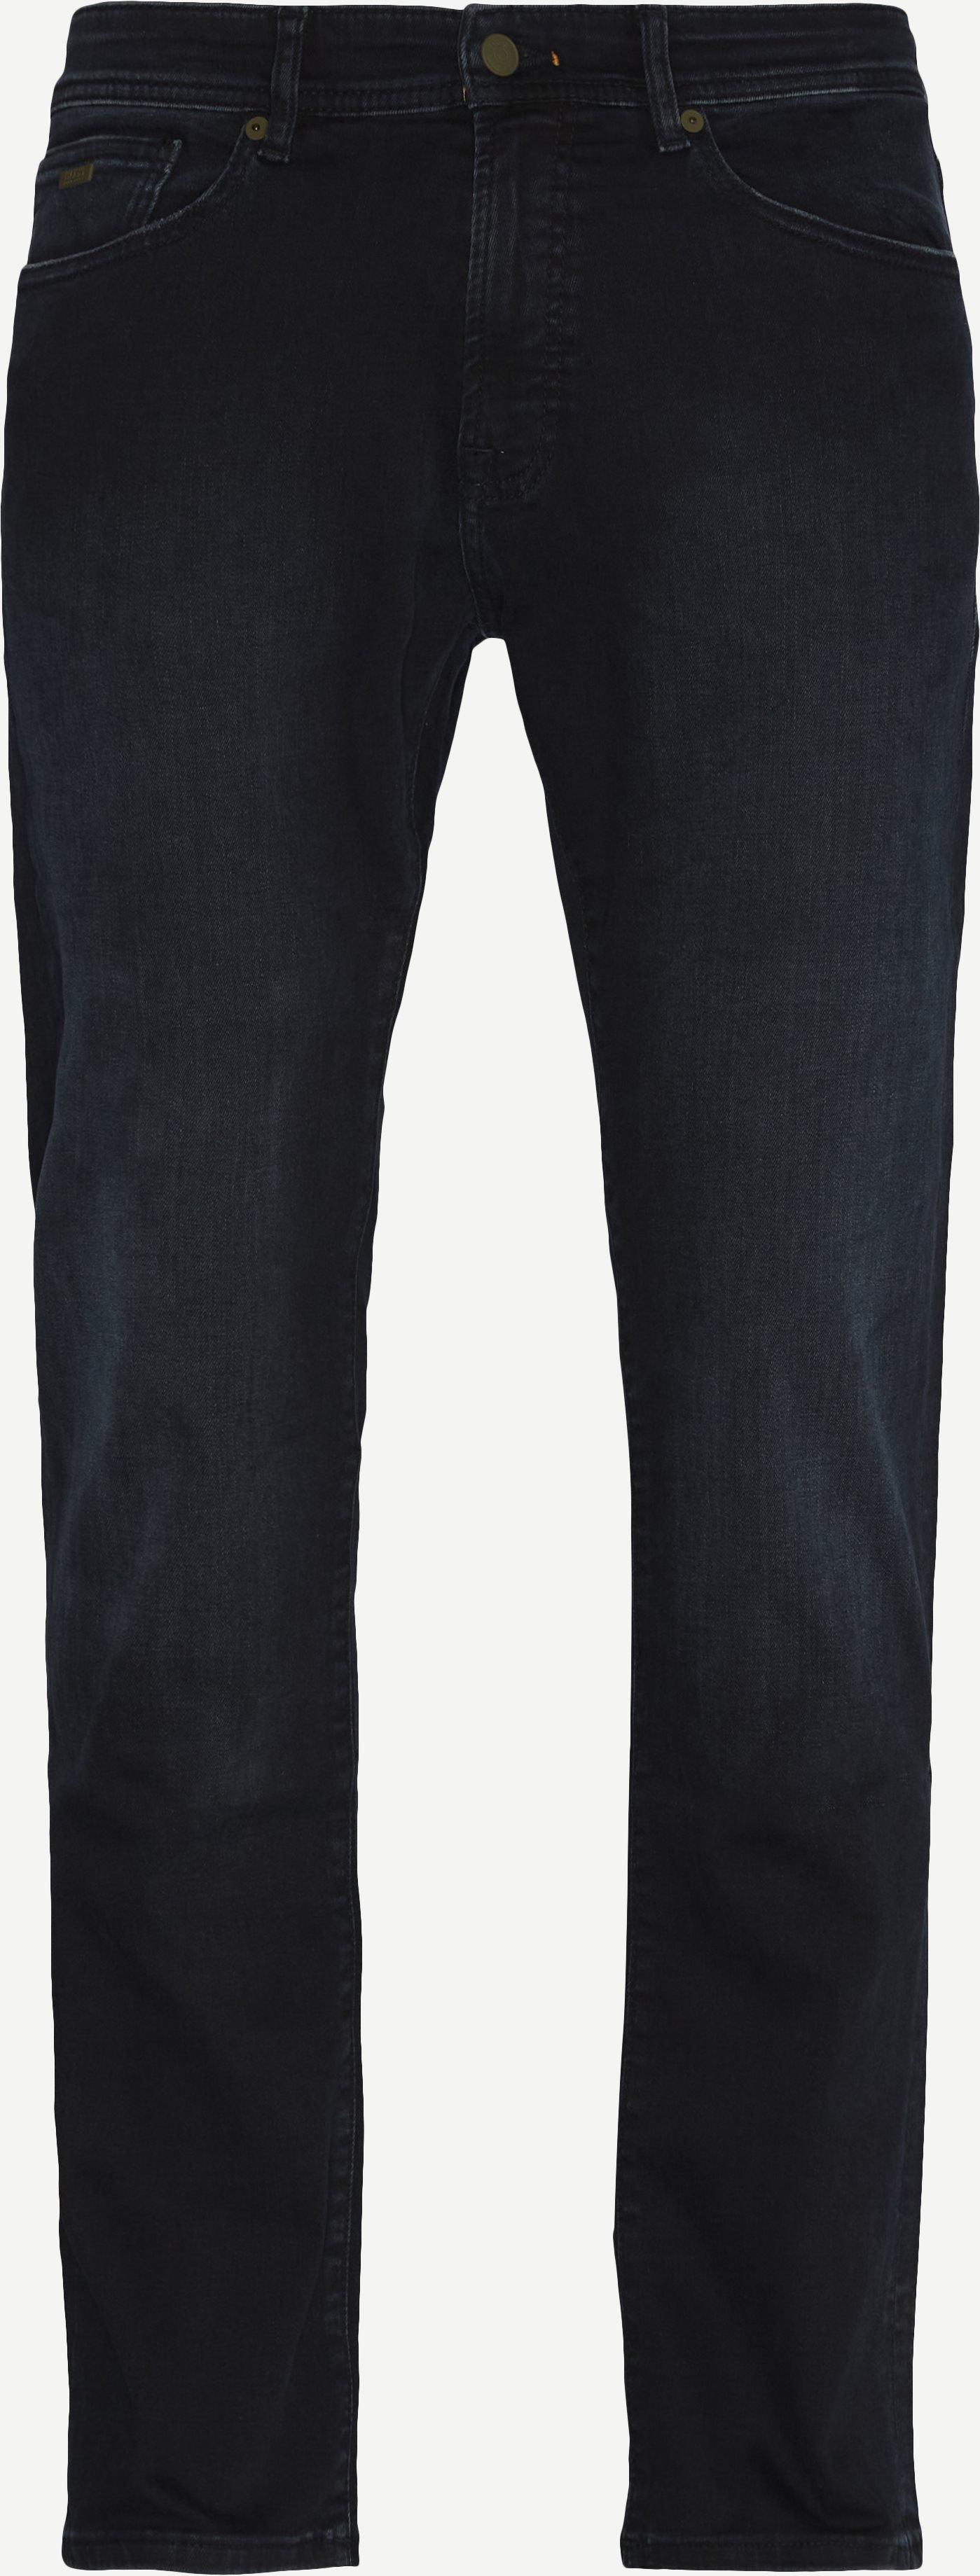 Jeans - Regular fit - Jeans-Blau